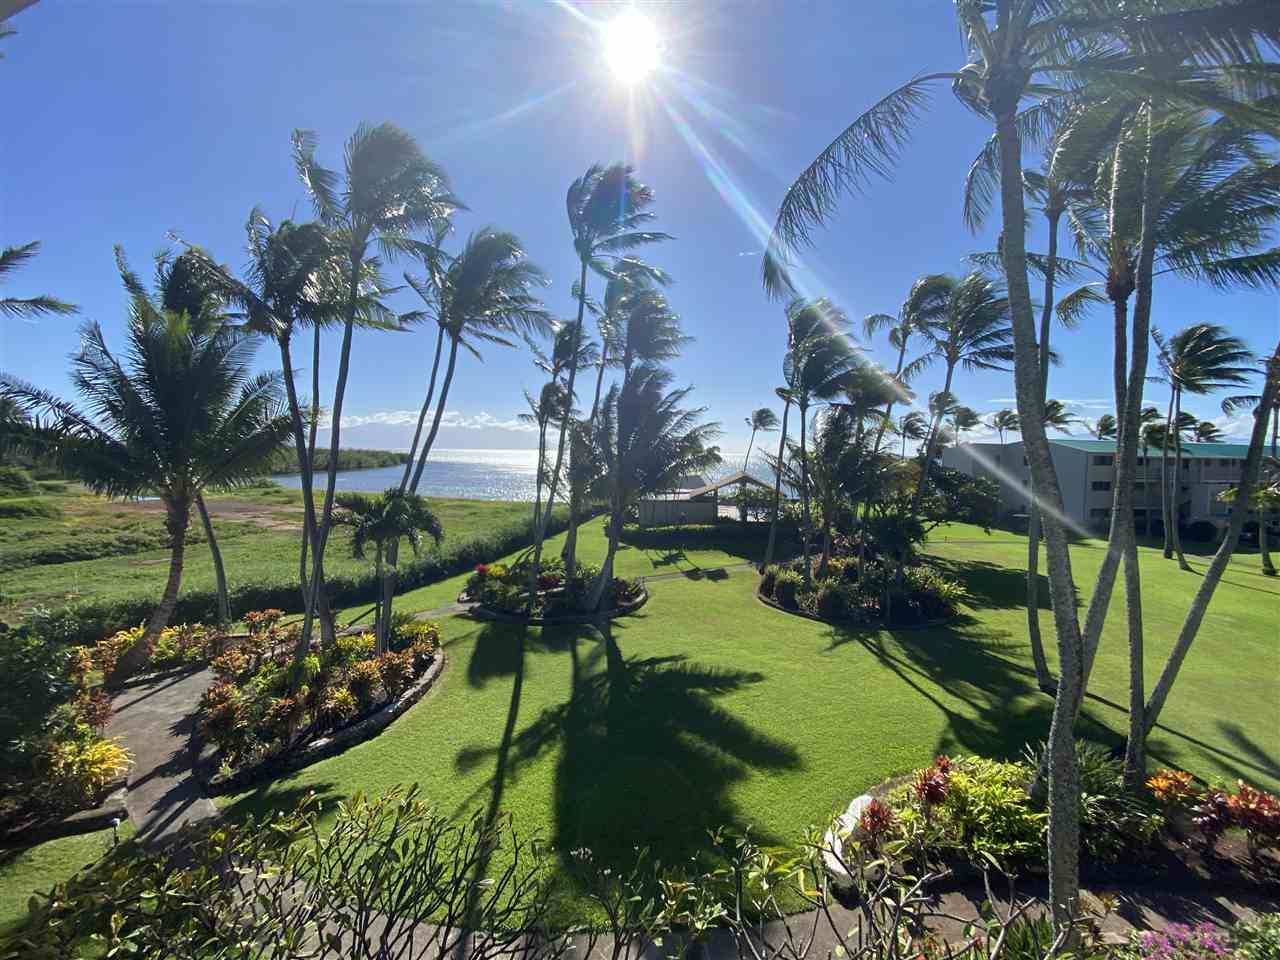 Photo of 7146 Kamehameha V Hwy #C308, Kaunakakai, HI 96748 (MLS # 389581)